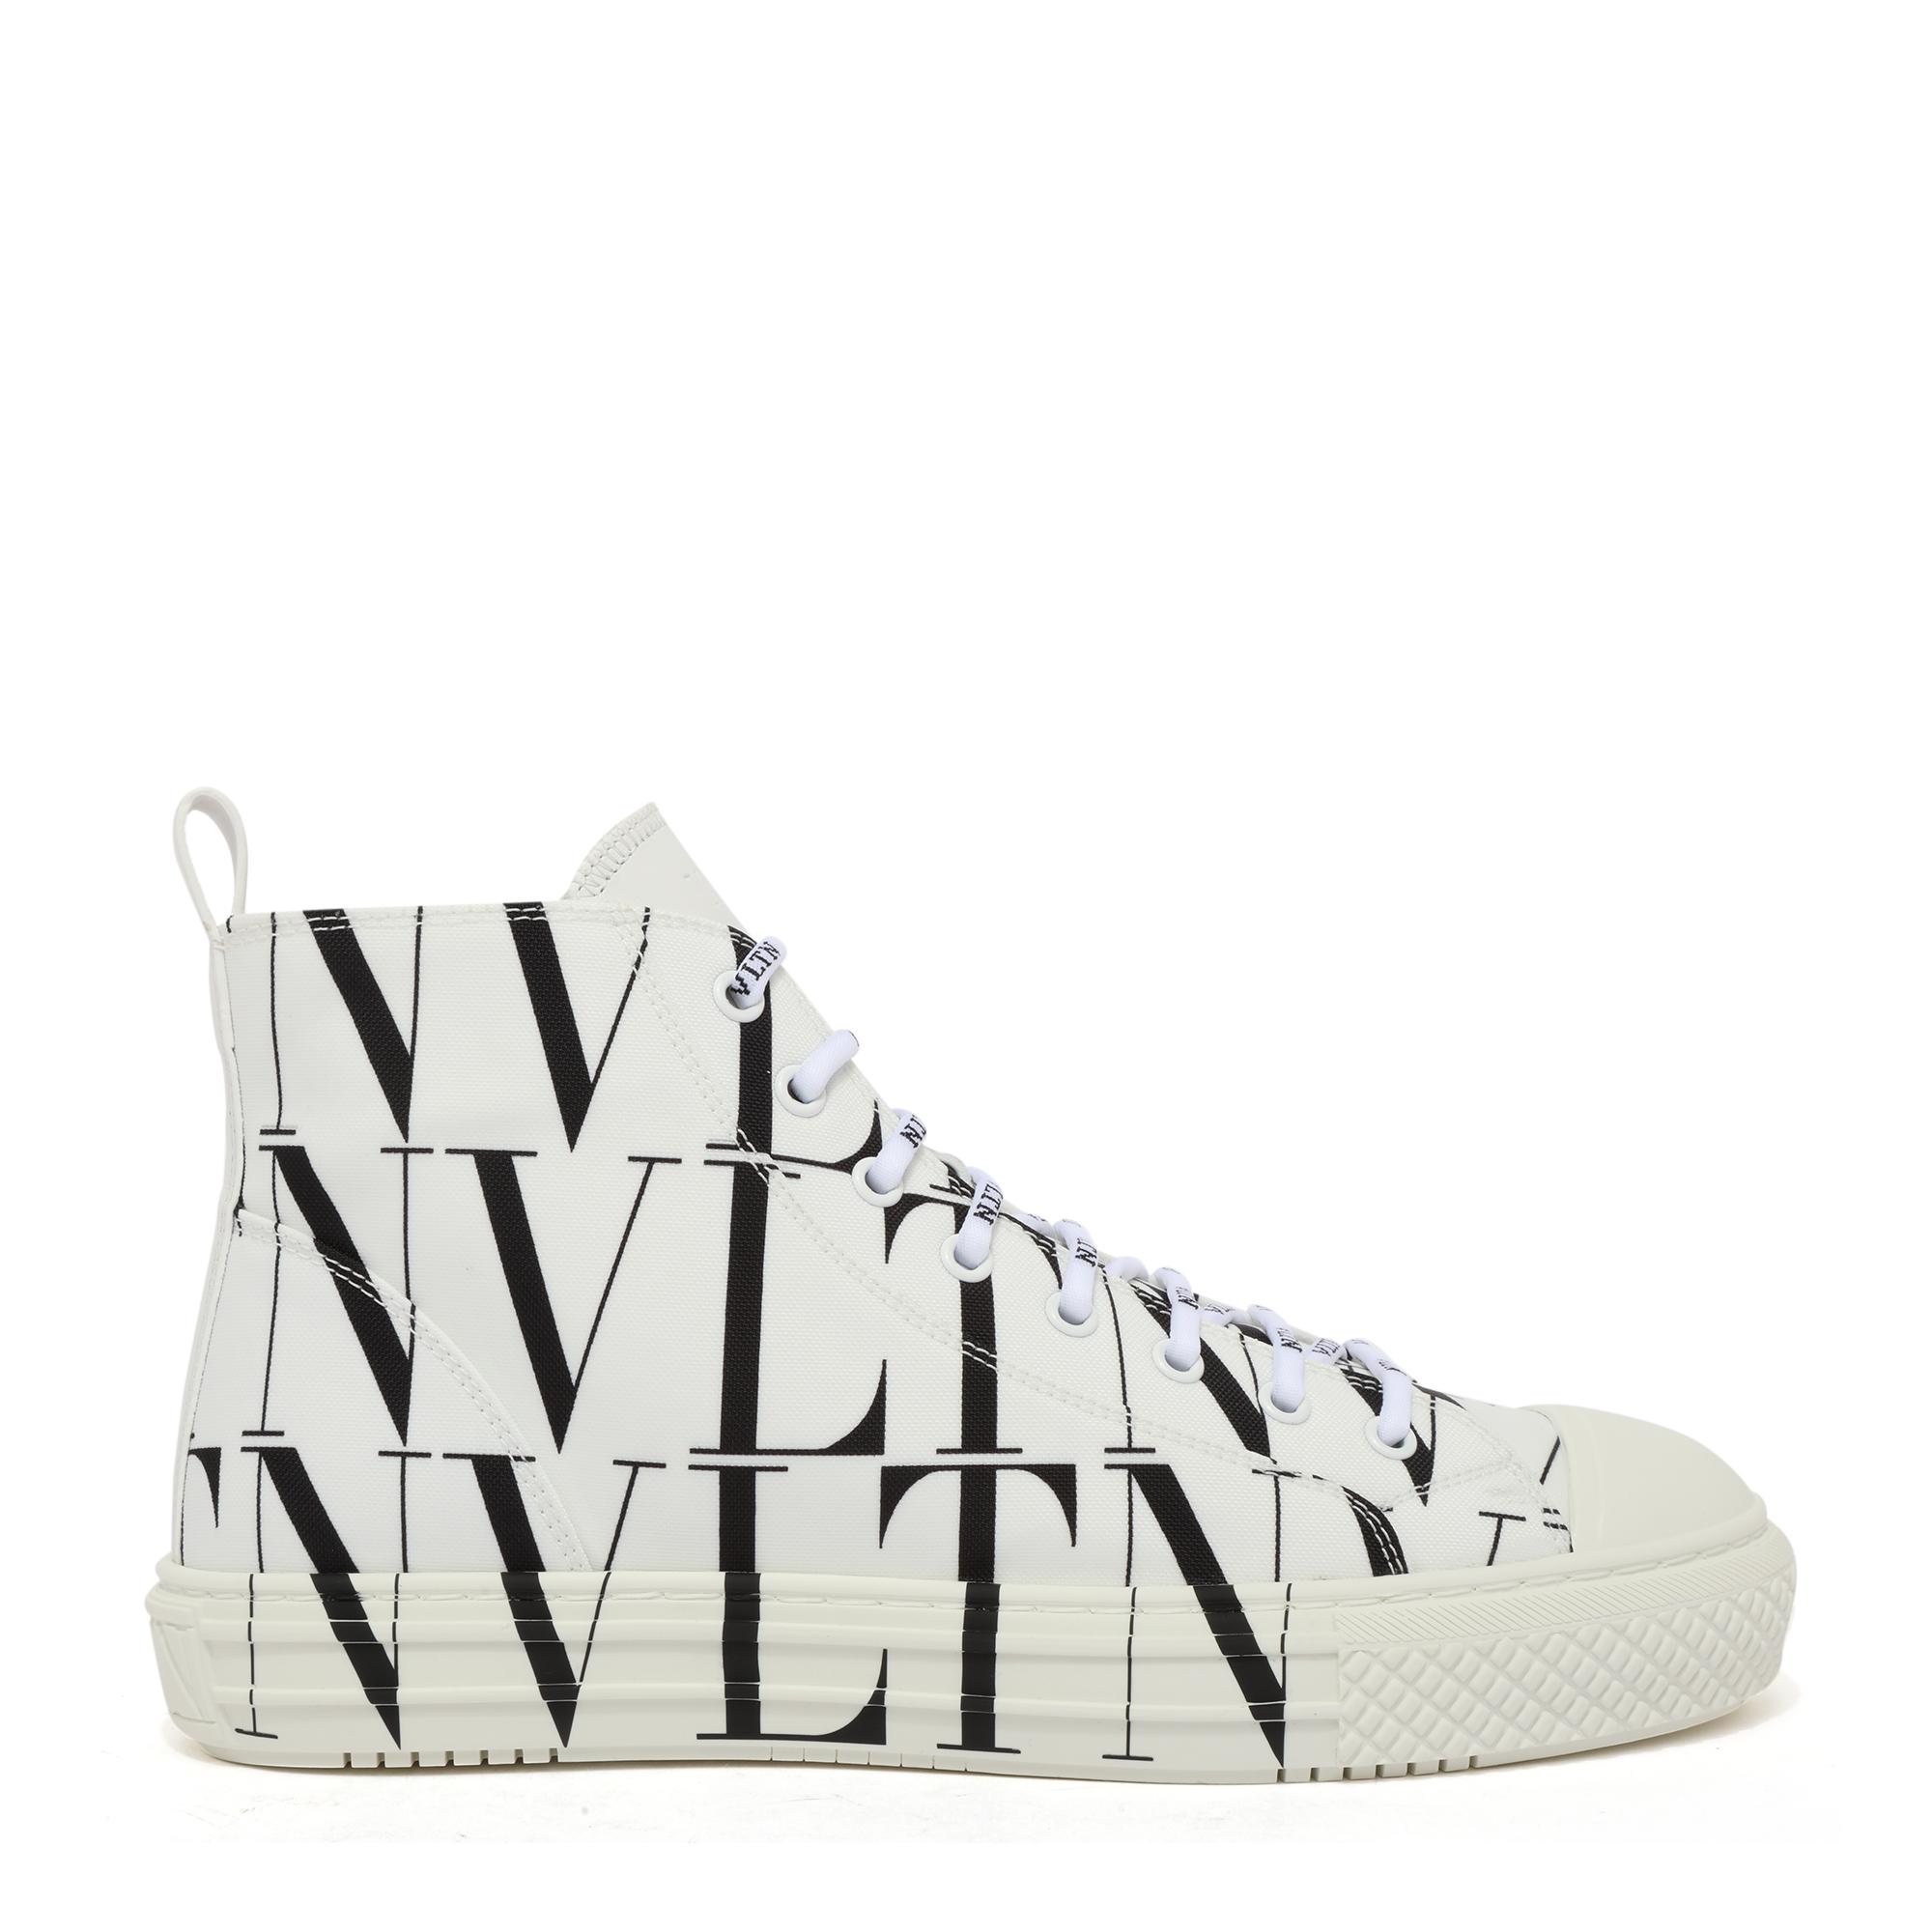 Giggies sneakers